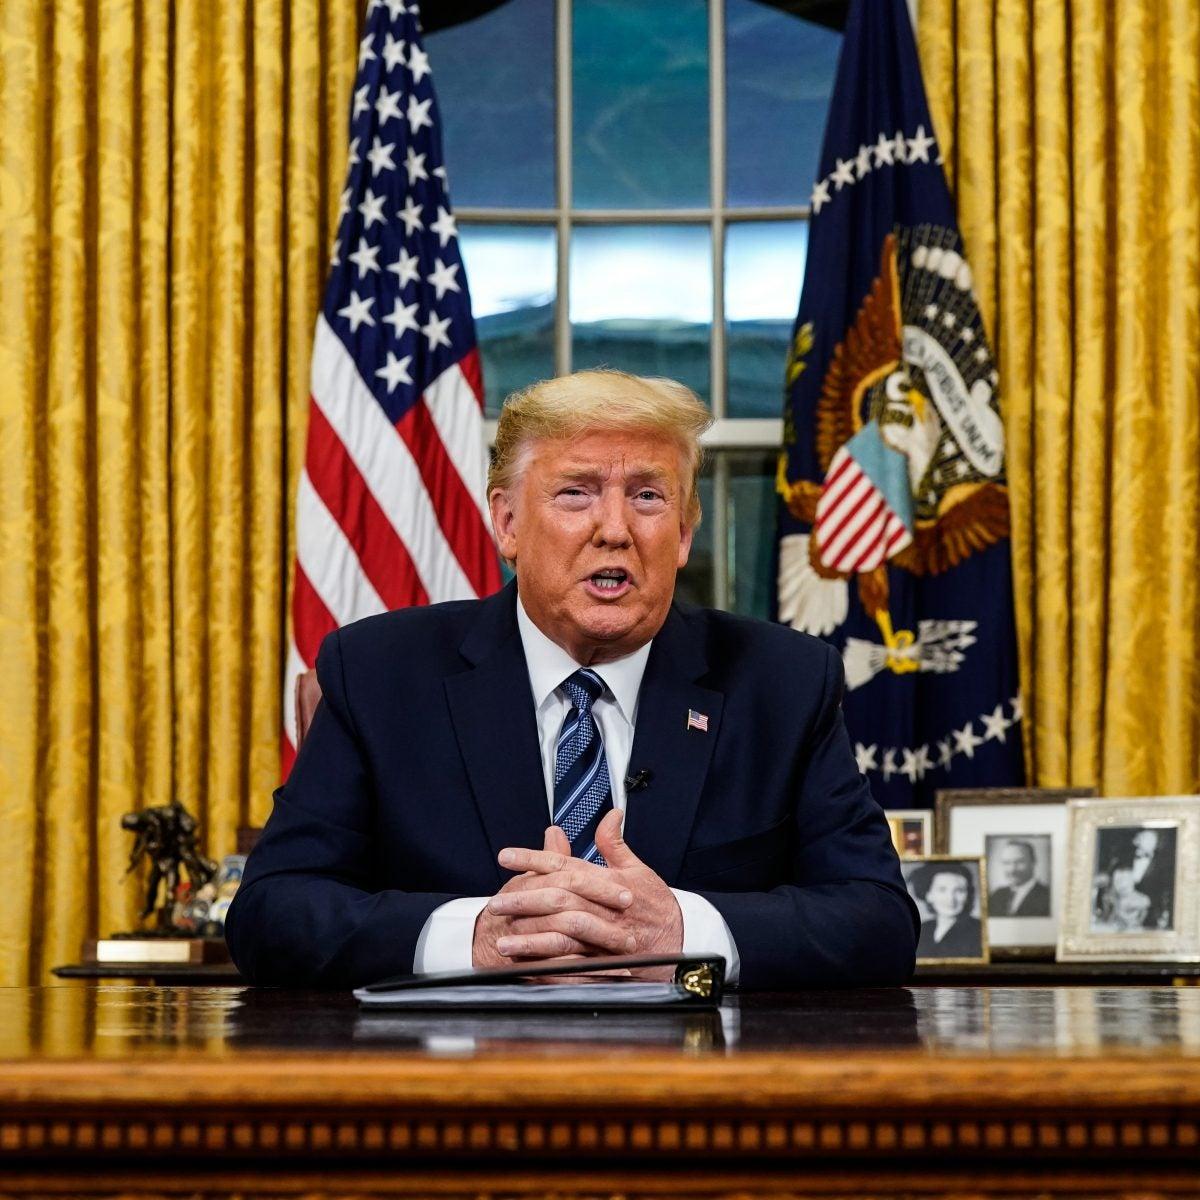 Trump Restricts Travel From Europe Amid Coronavirus Crisis